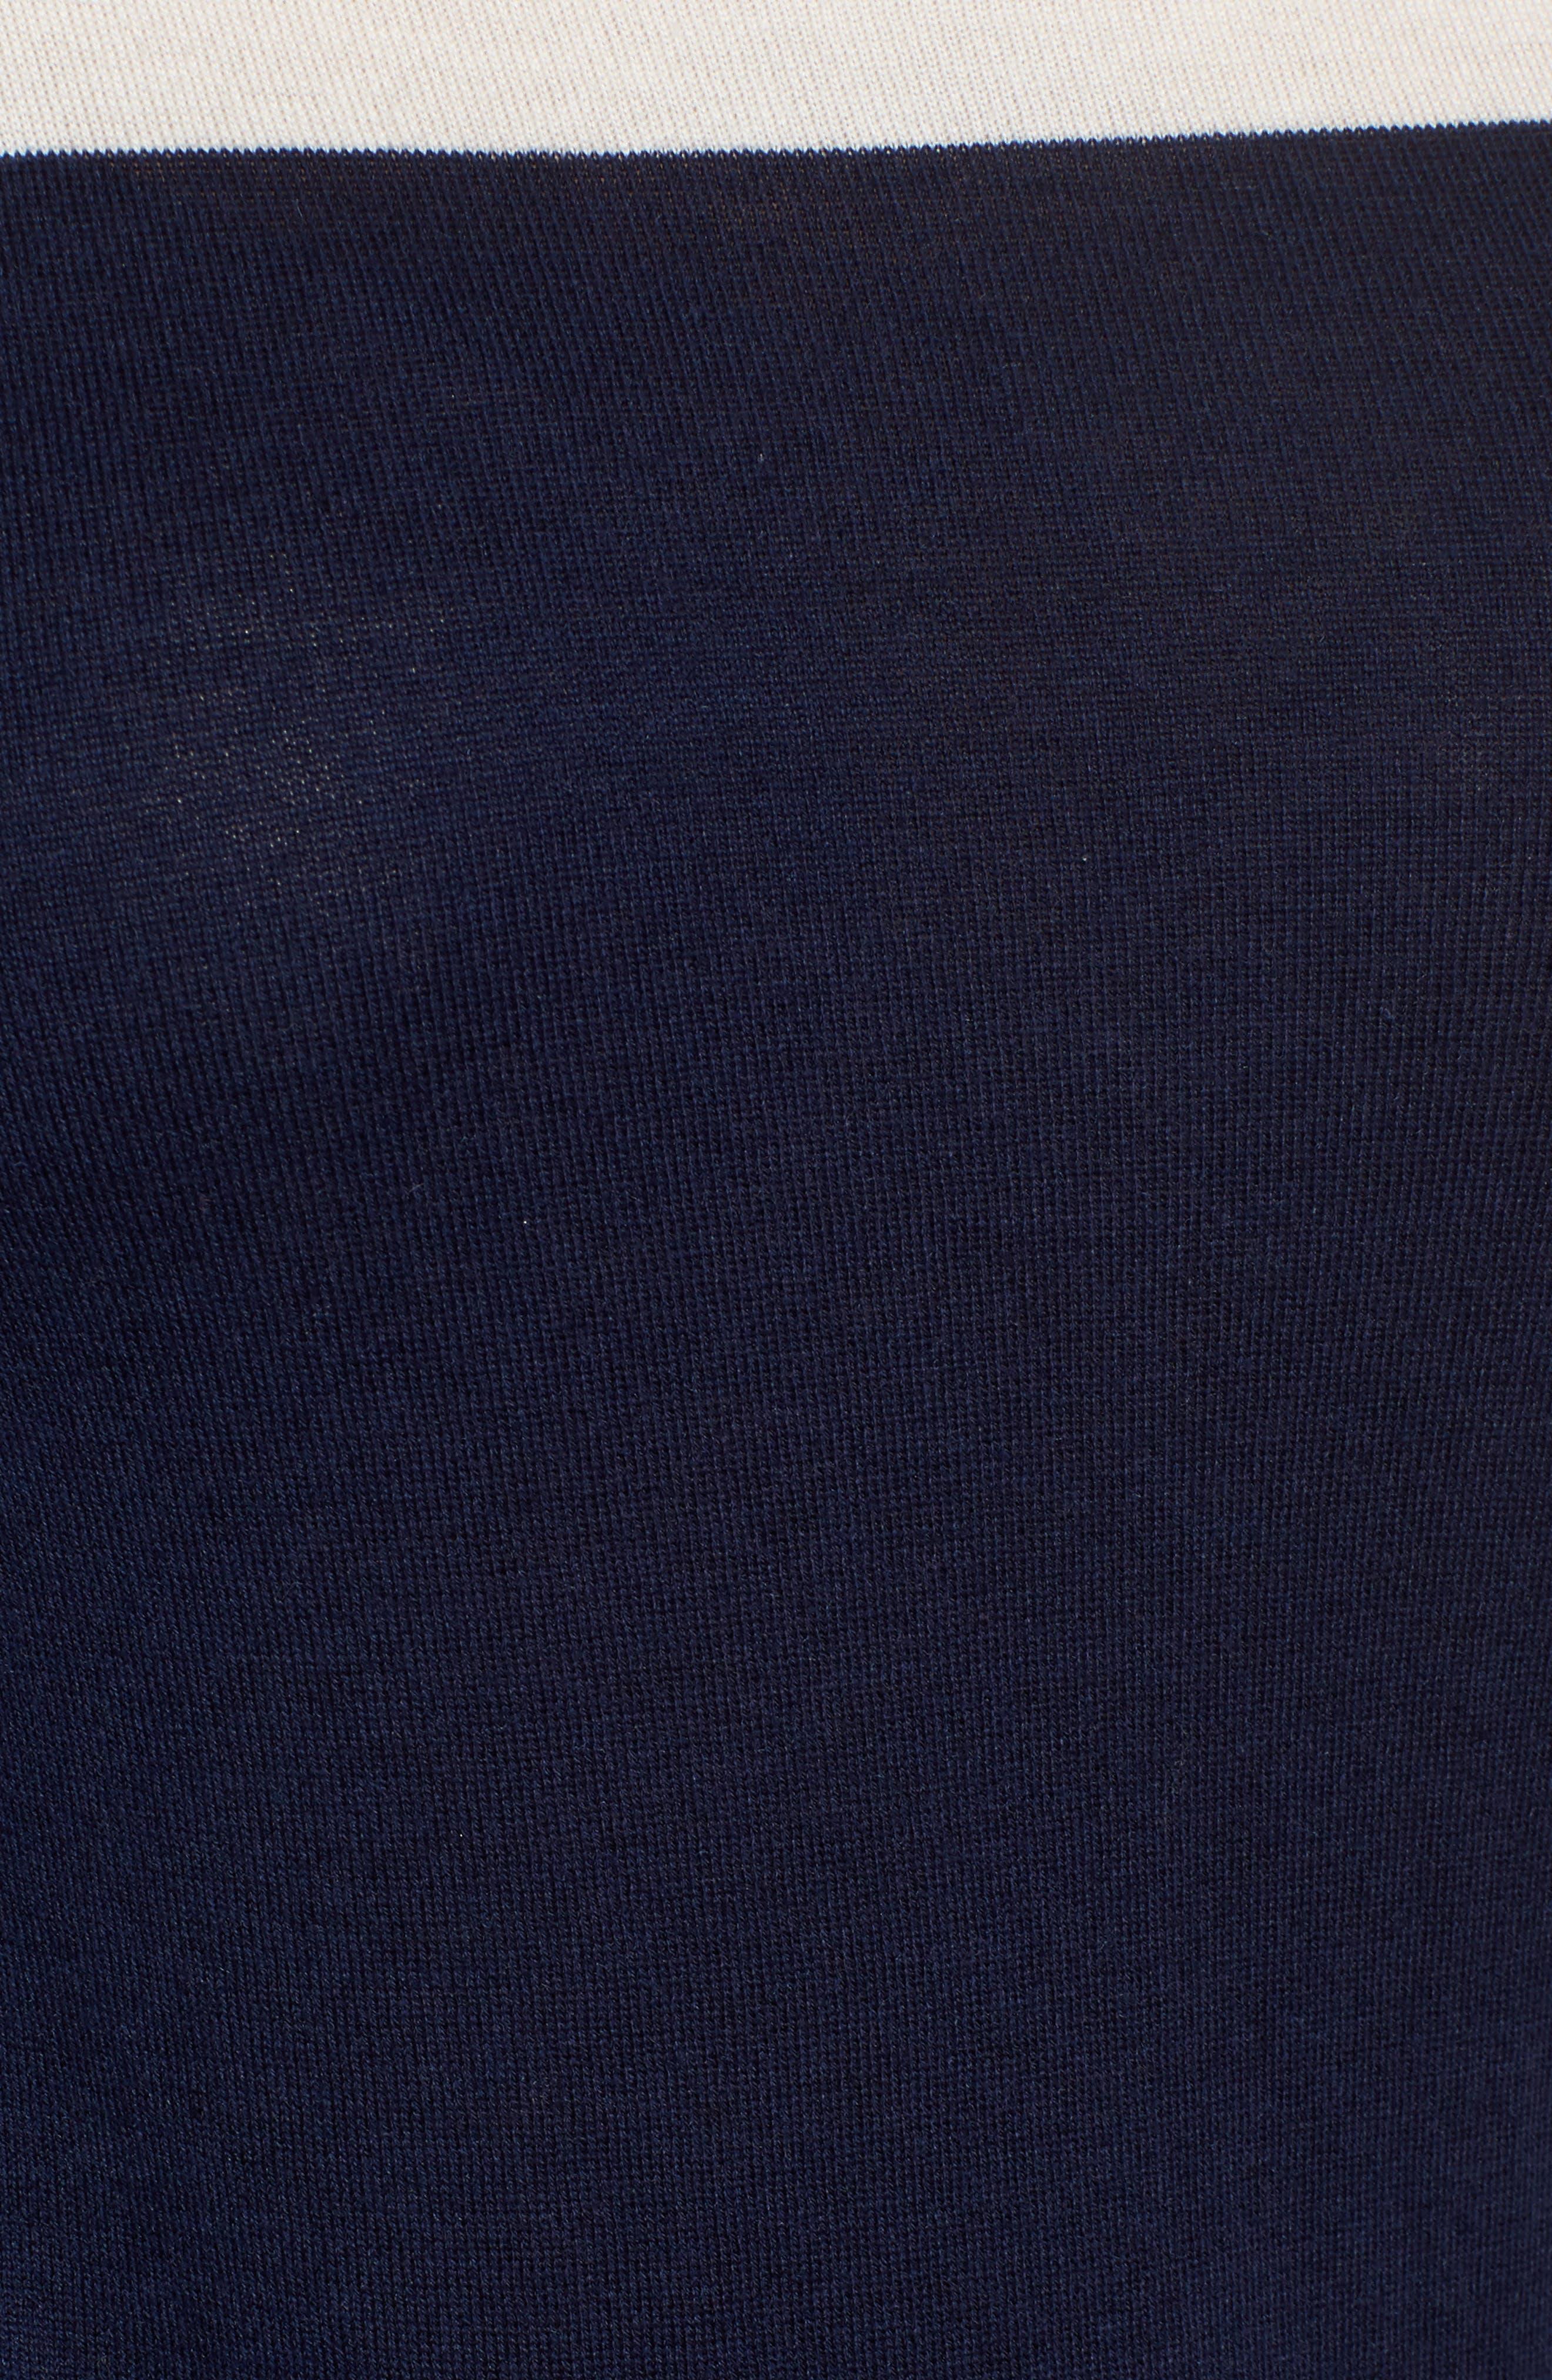 Cotton Blend Pullover,                             Alternate thumbnail 162, color,